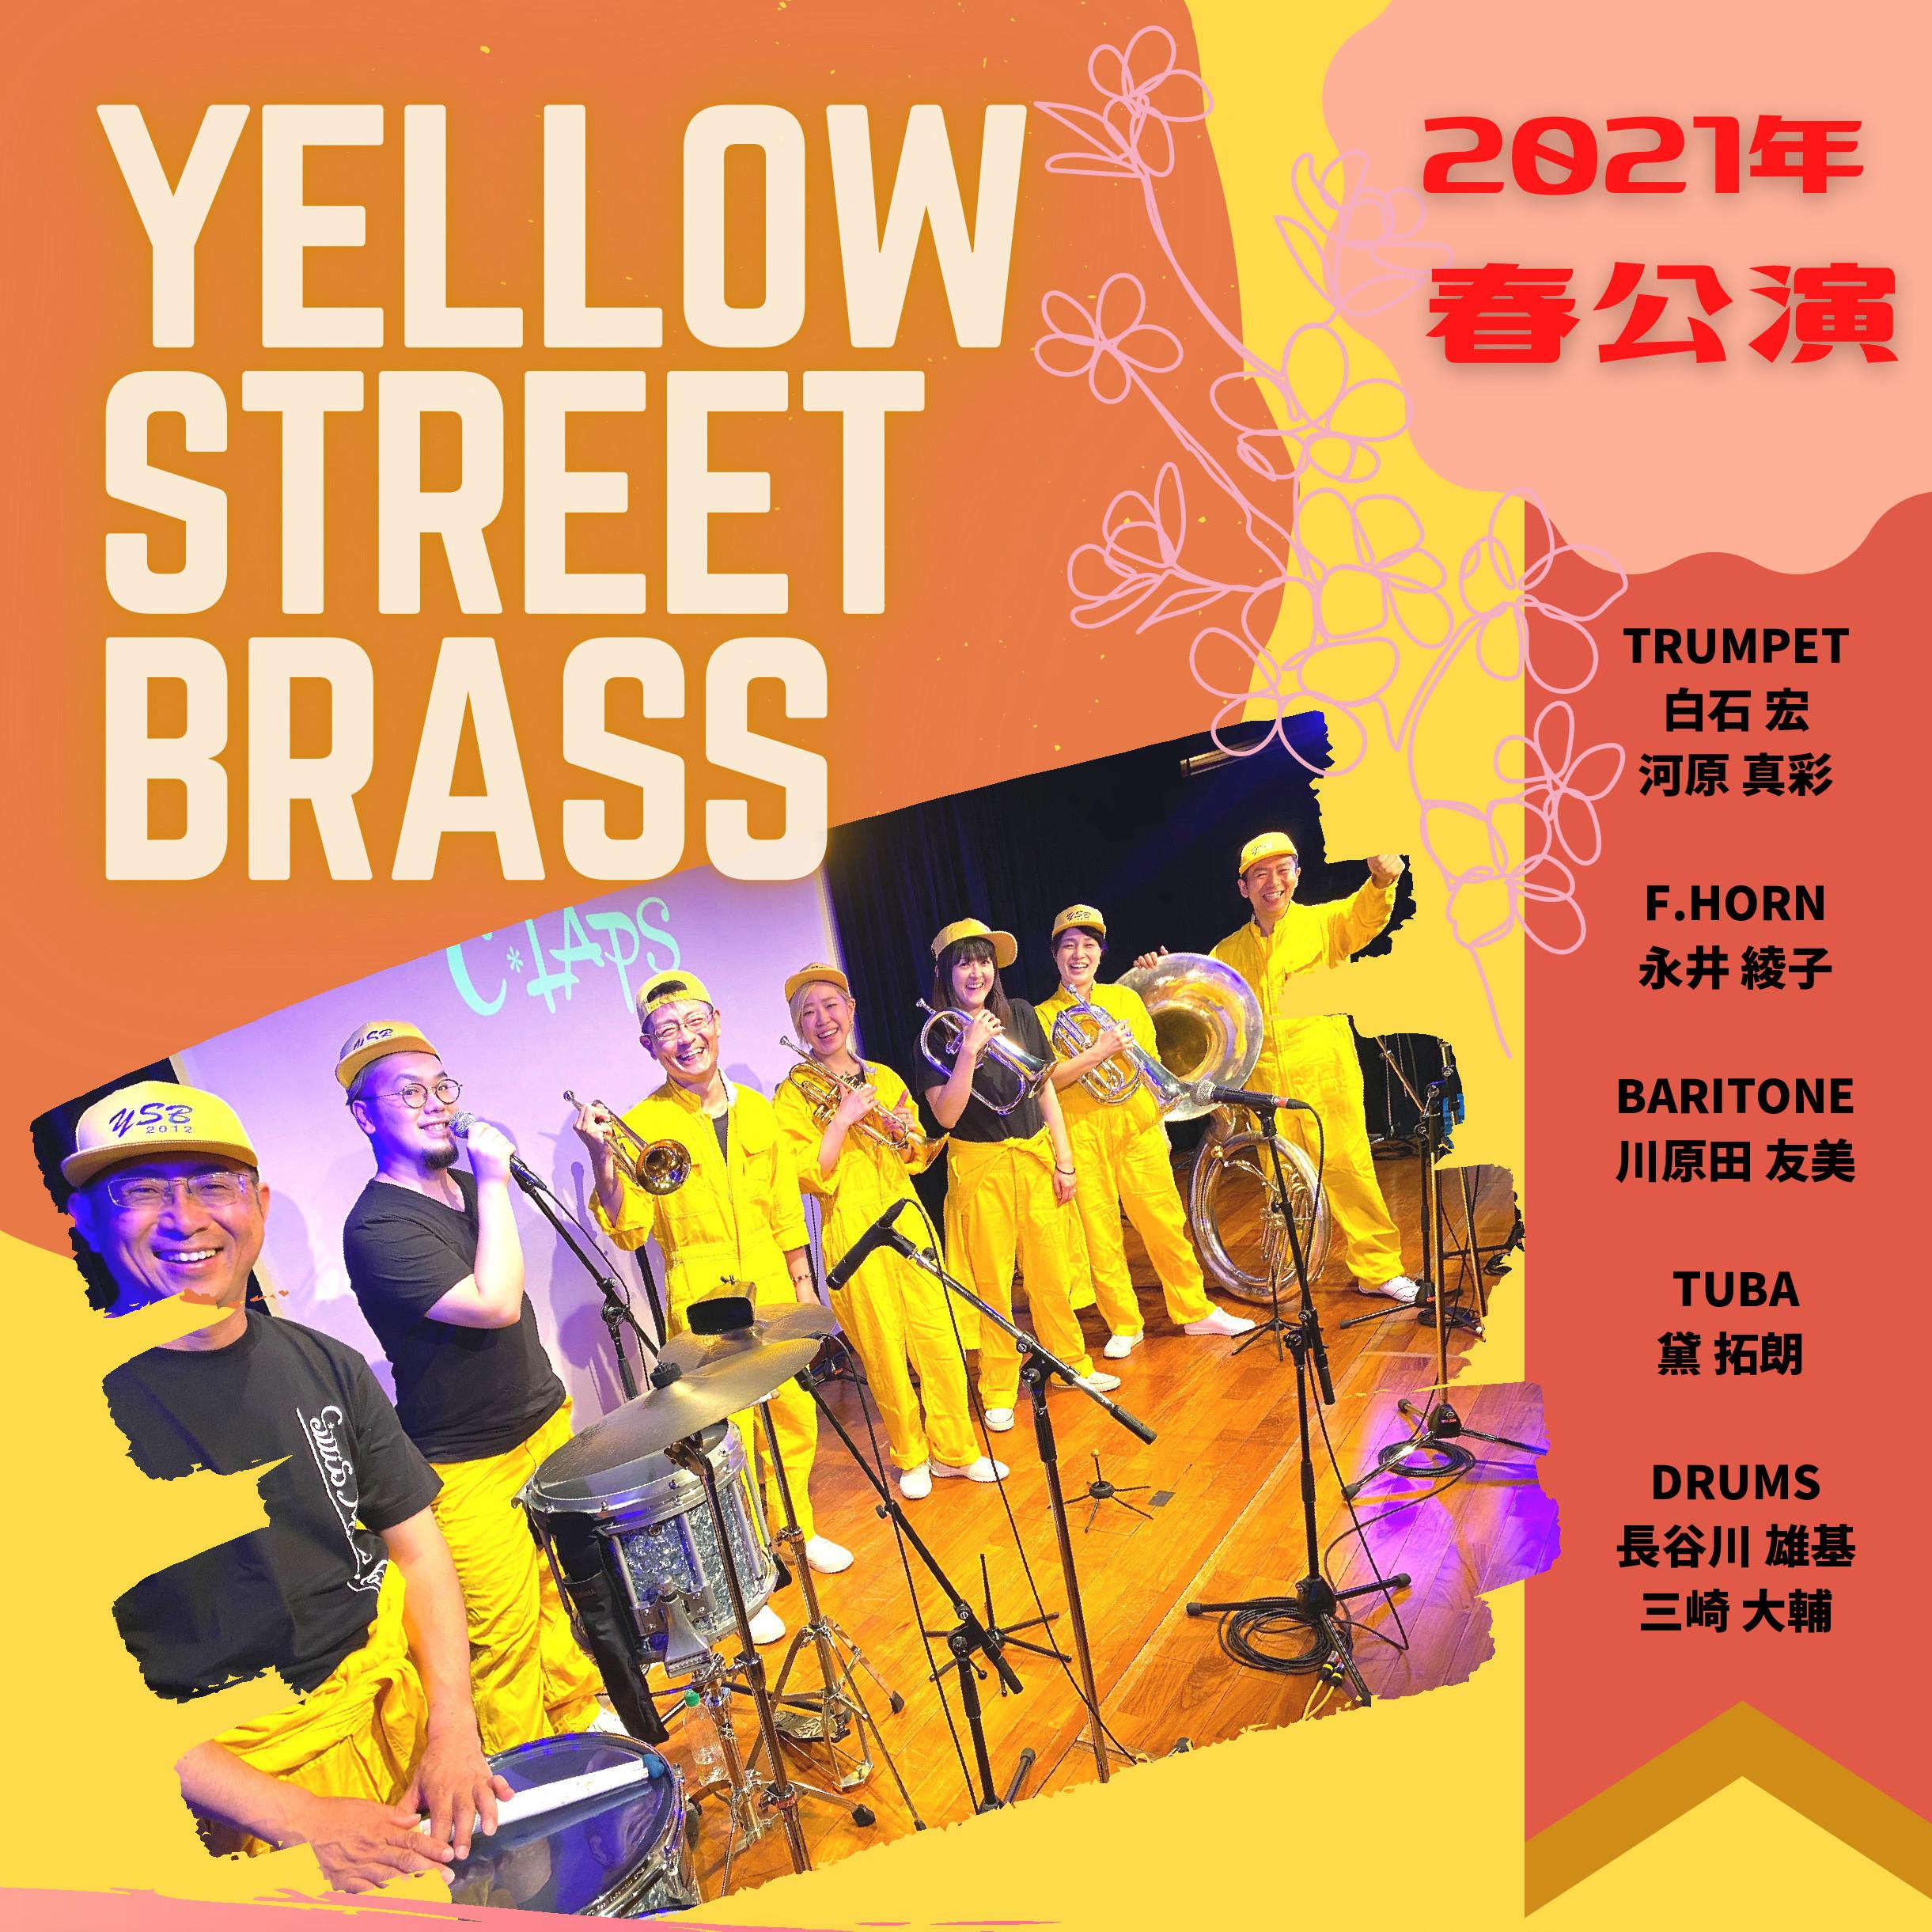 Yellow Street Brass